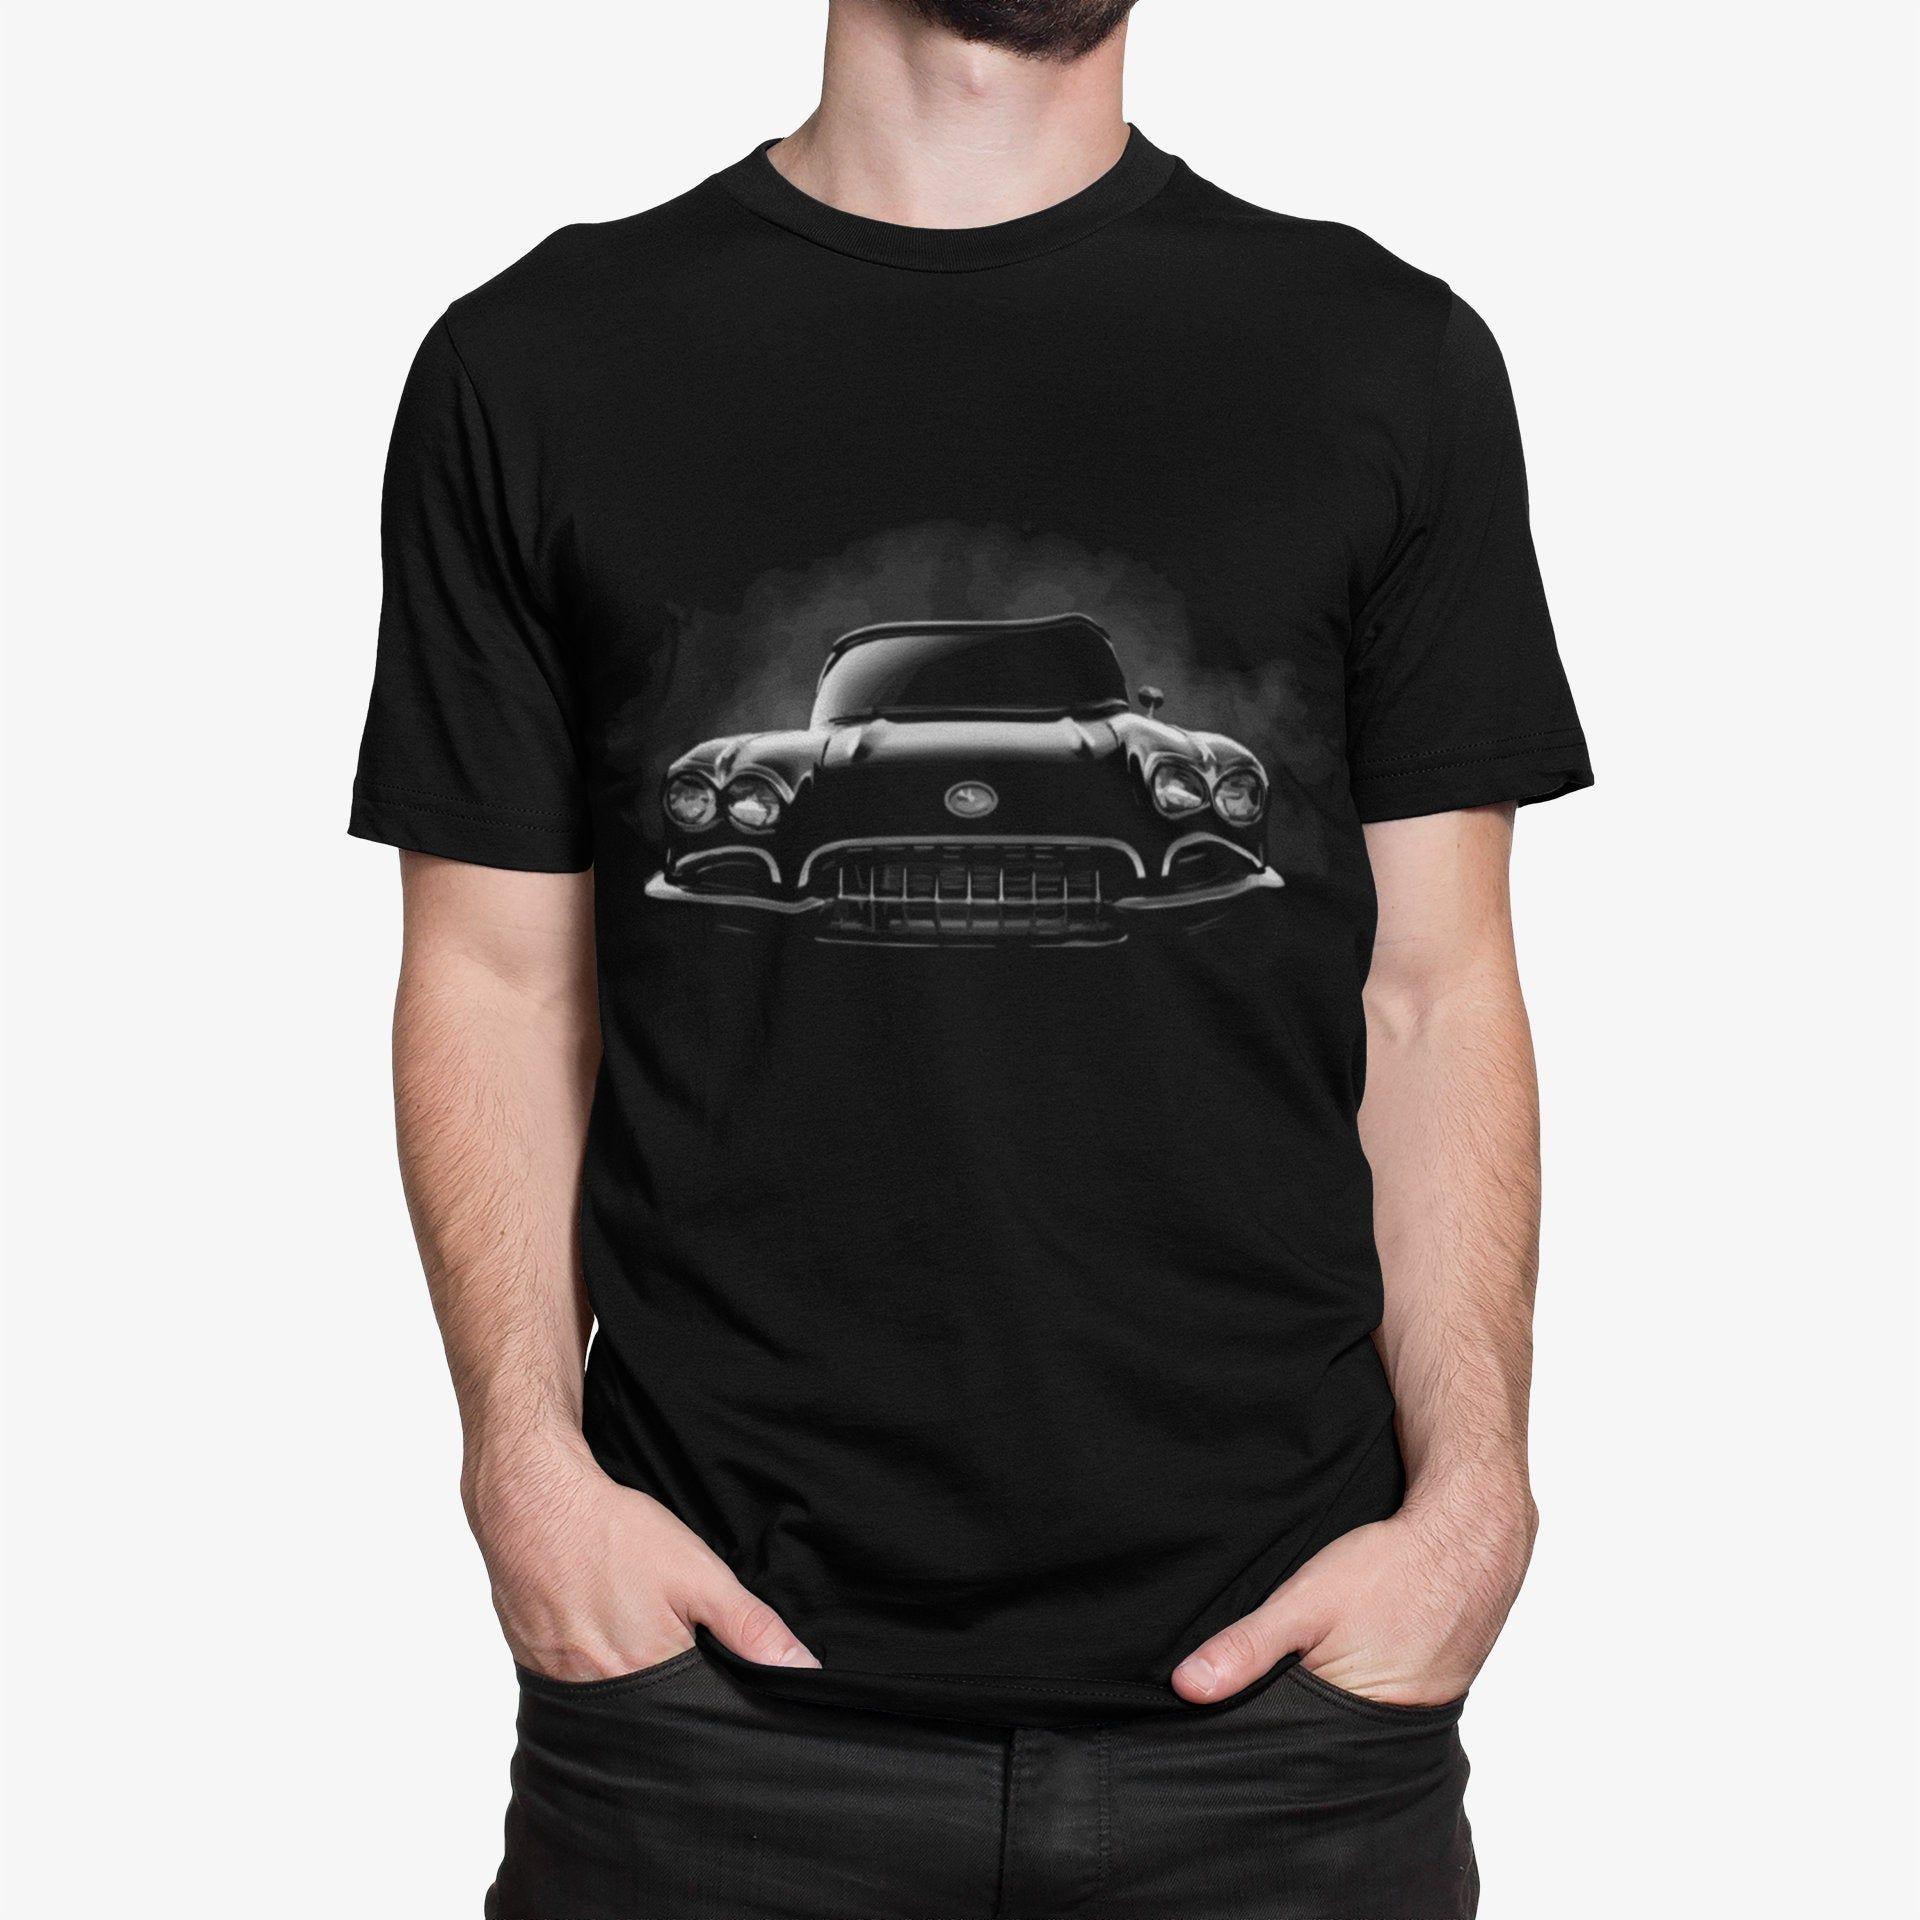 1959 Corvette Classic Car Short-Sleeve Unisex T-Shirt